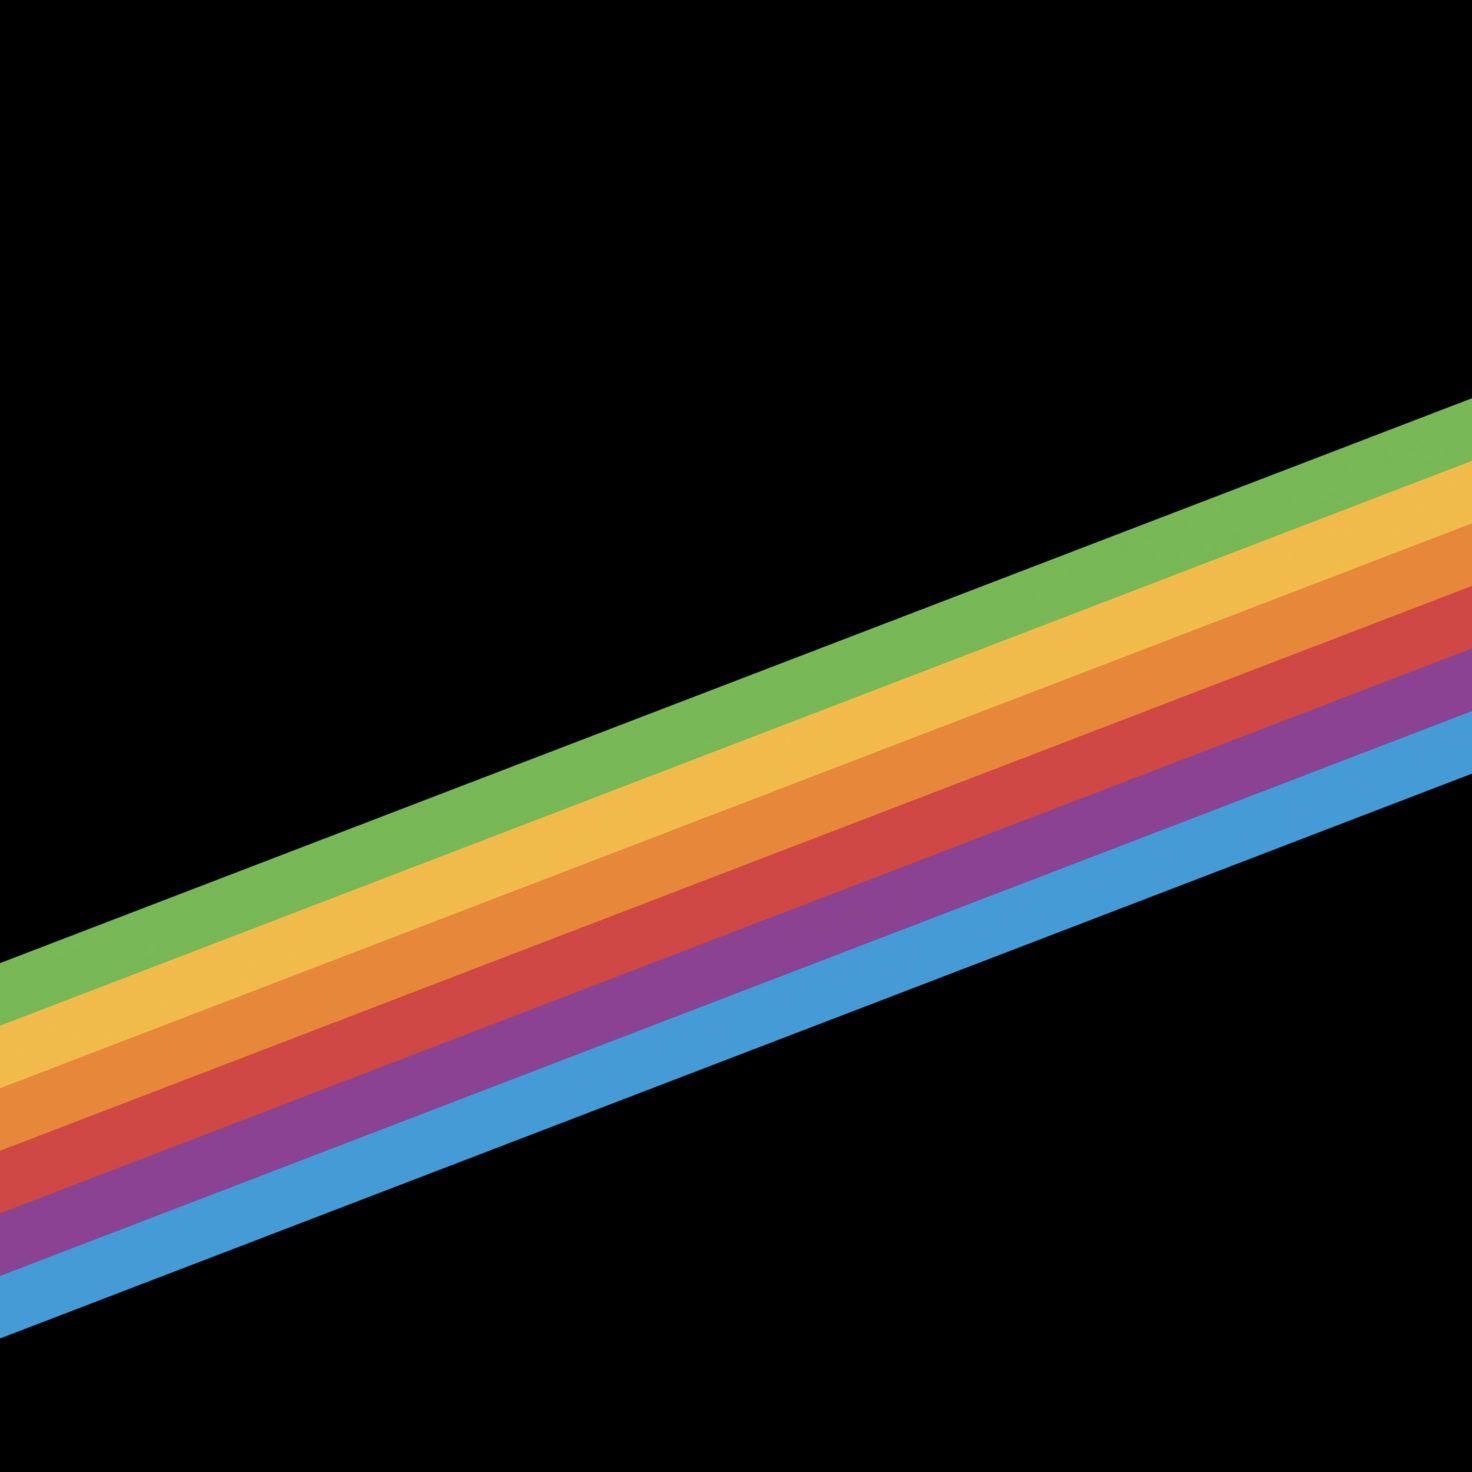 Ios 11 Wallpaper Iphone Hd Background Wallpaper Ios 11 Wallpaper Iphone Wallpaper Universe Rainbow Wallpaper